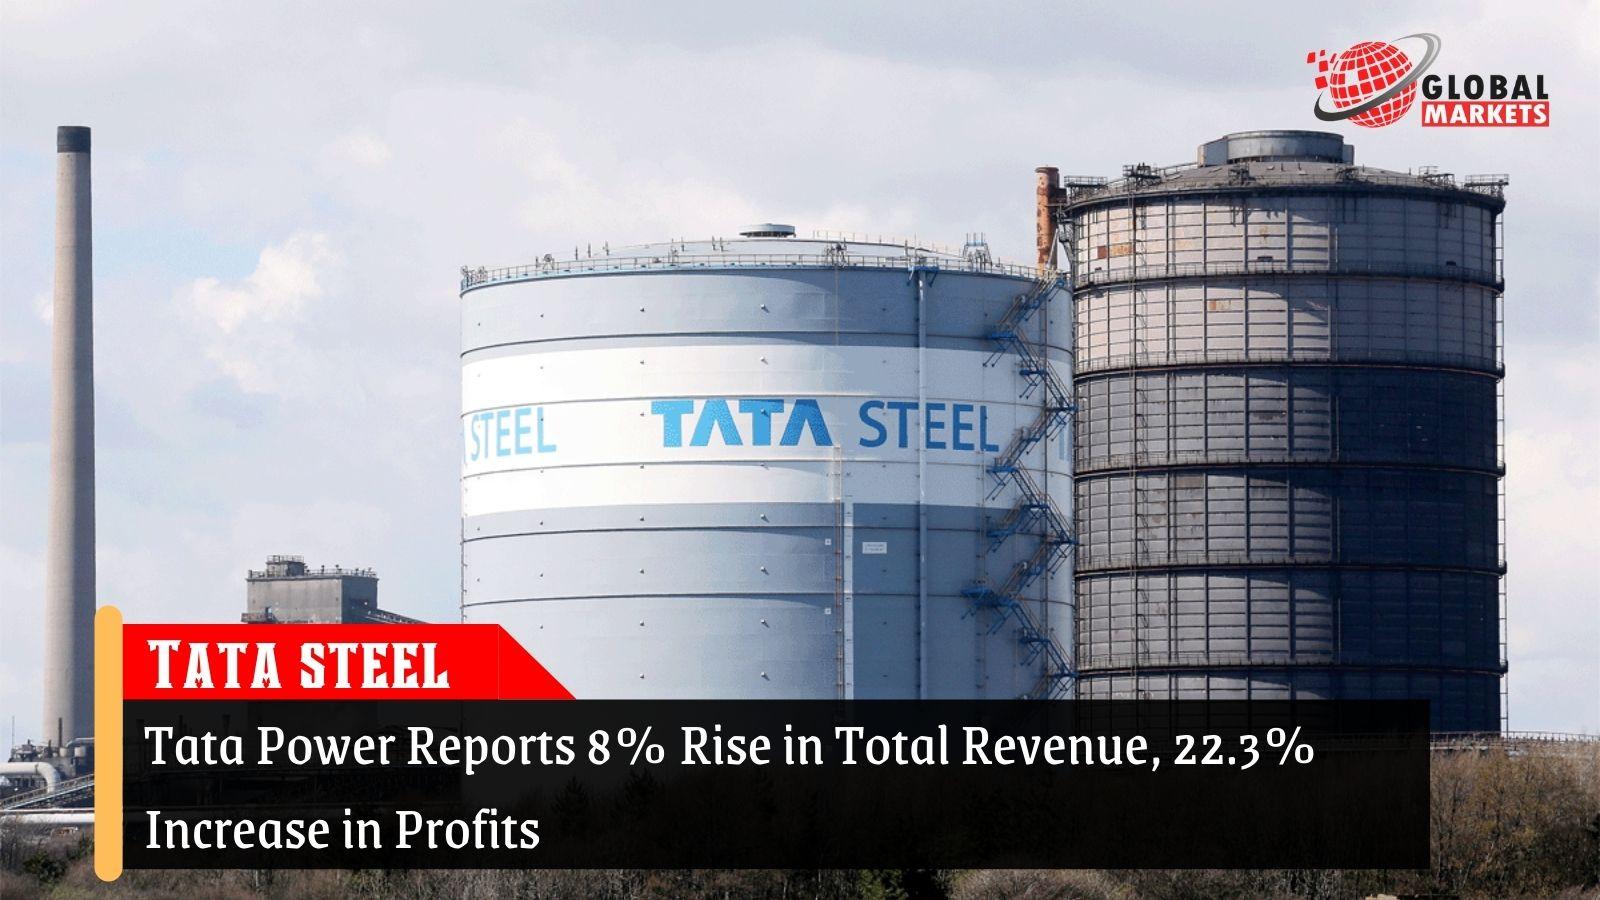 Tata Power Reports 8% Rise in Total Revenue, 22.3% Increase in Profits